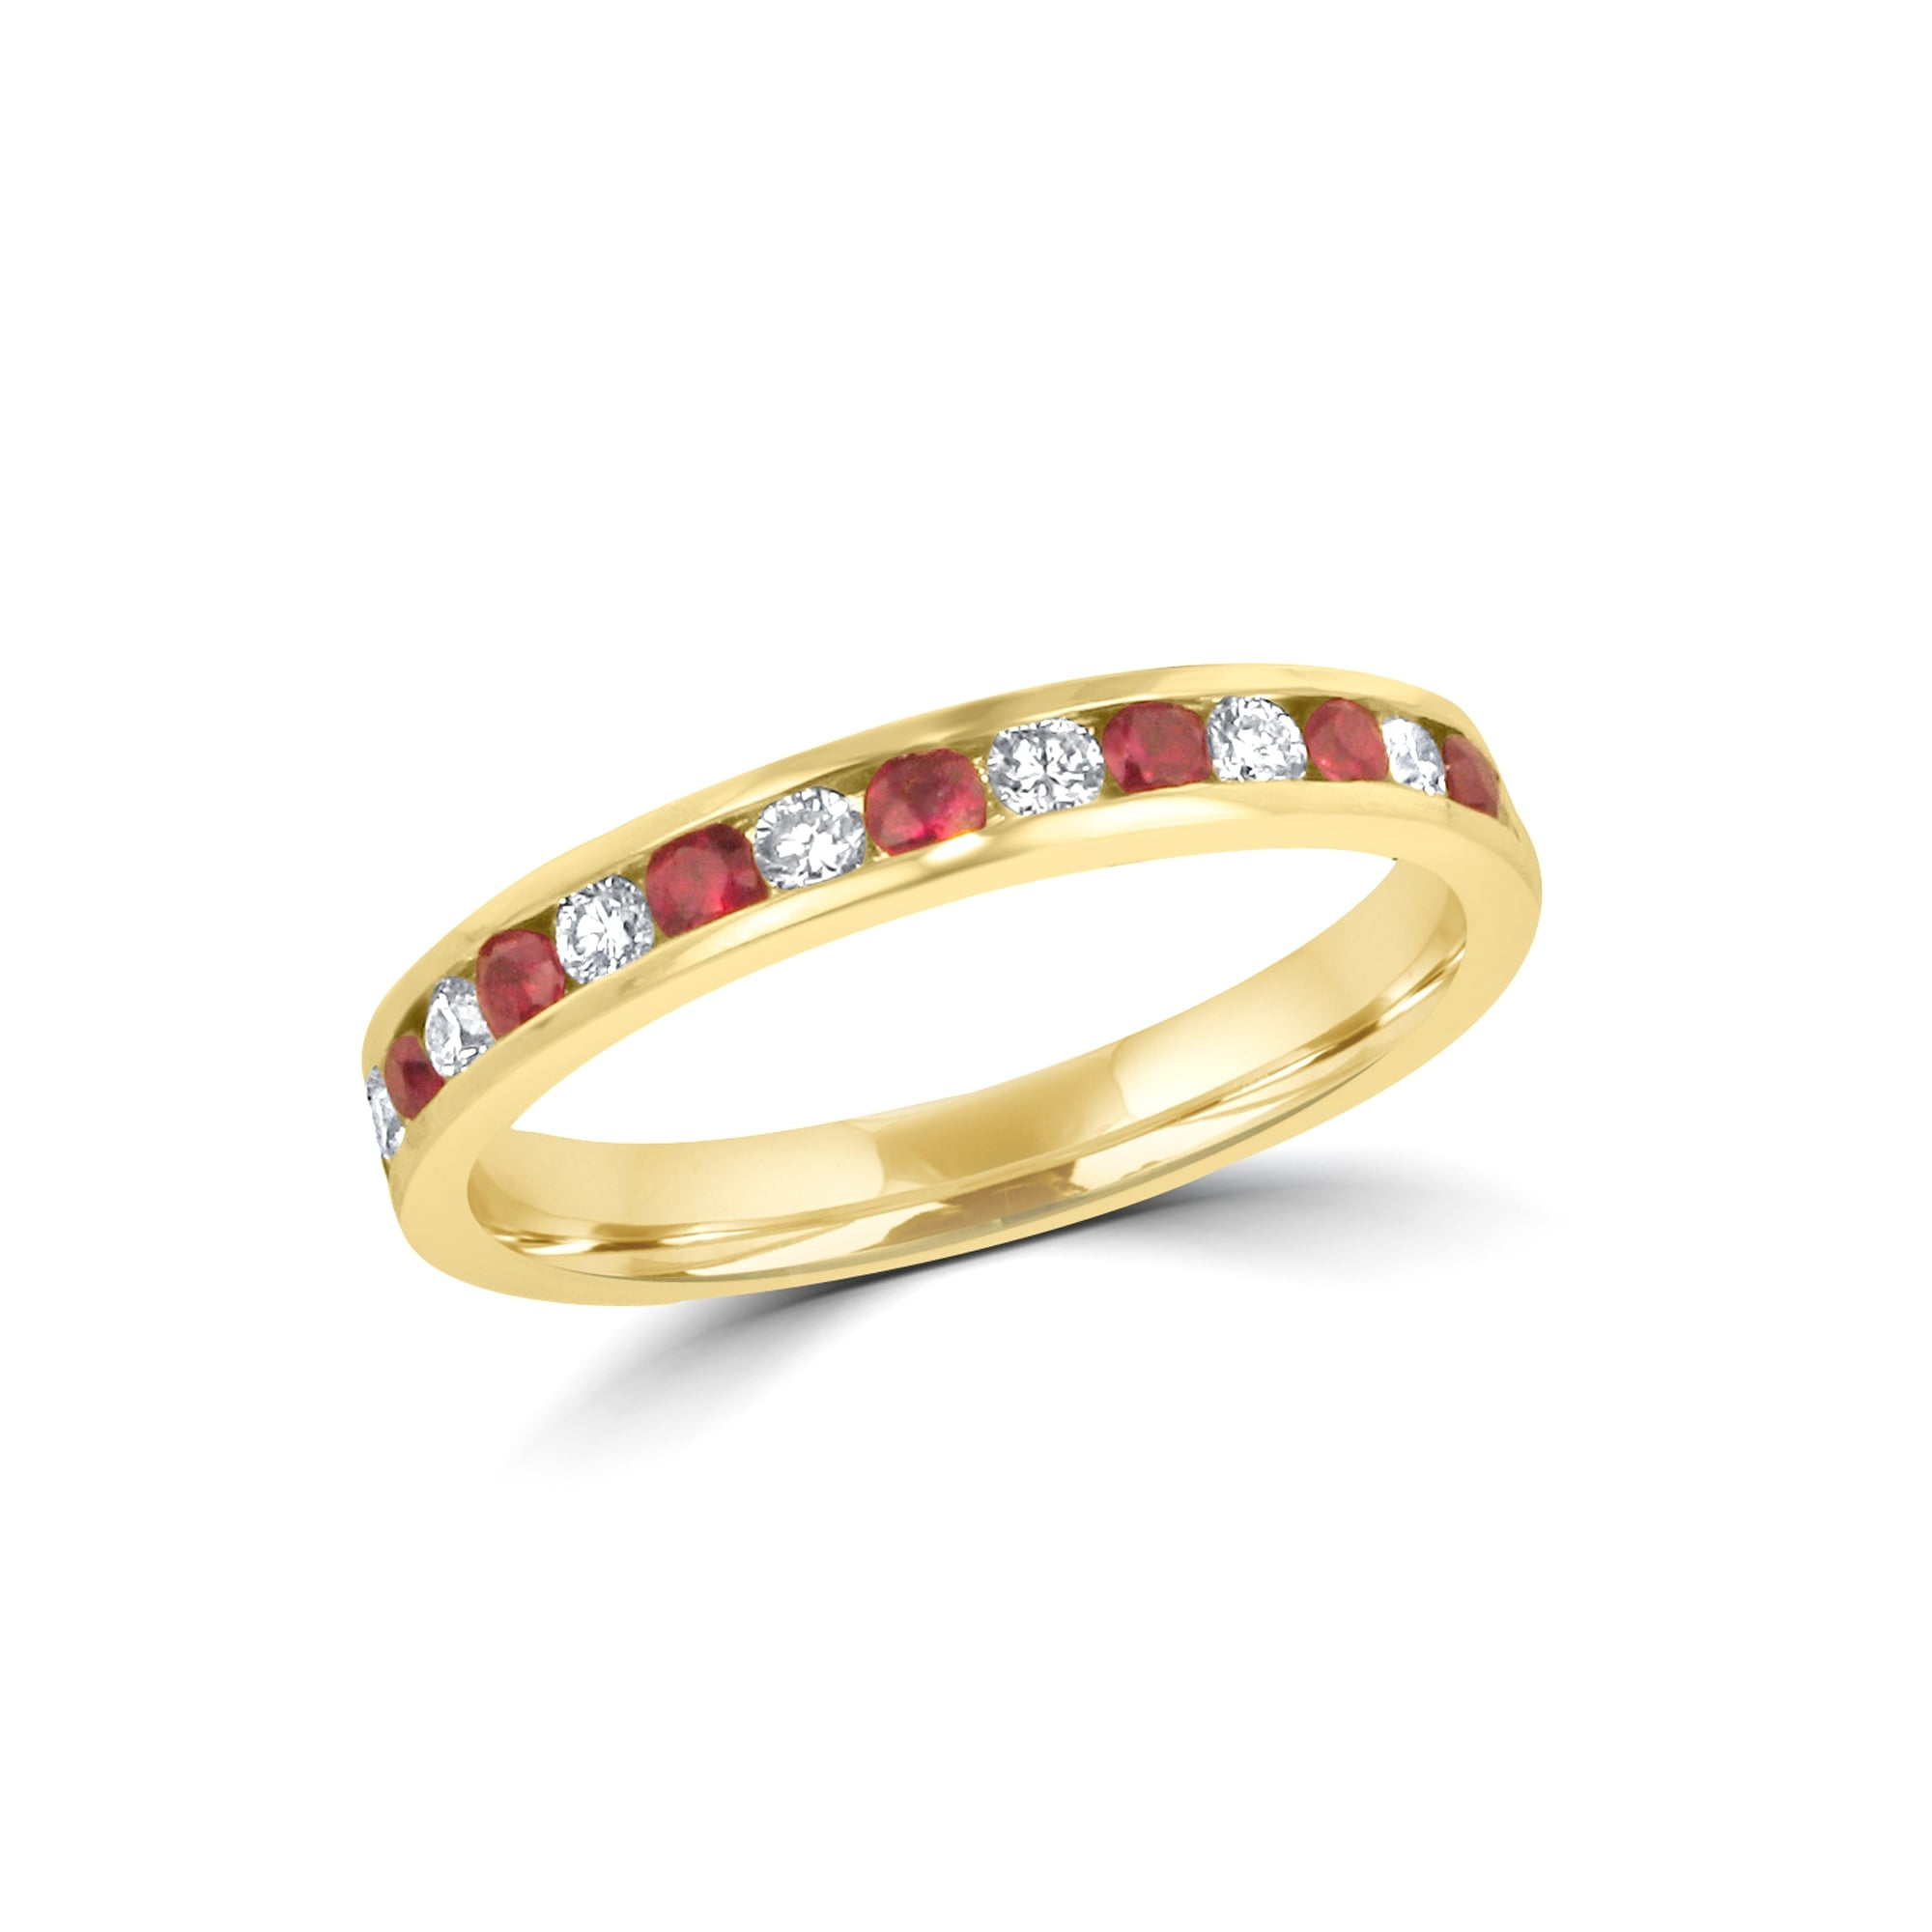 18ct Yellow Gold Ruby and Diamond Eternity Ring RYT3770 - Womens from  Avanti of Ashbourne Ltd UK c32fae736